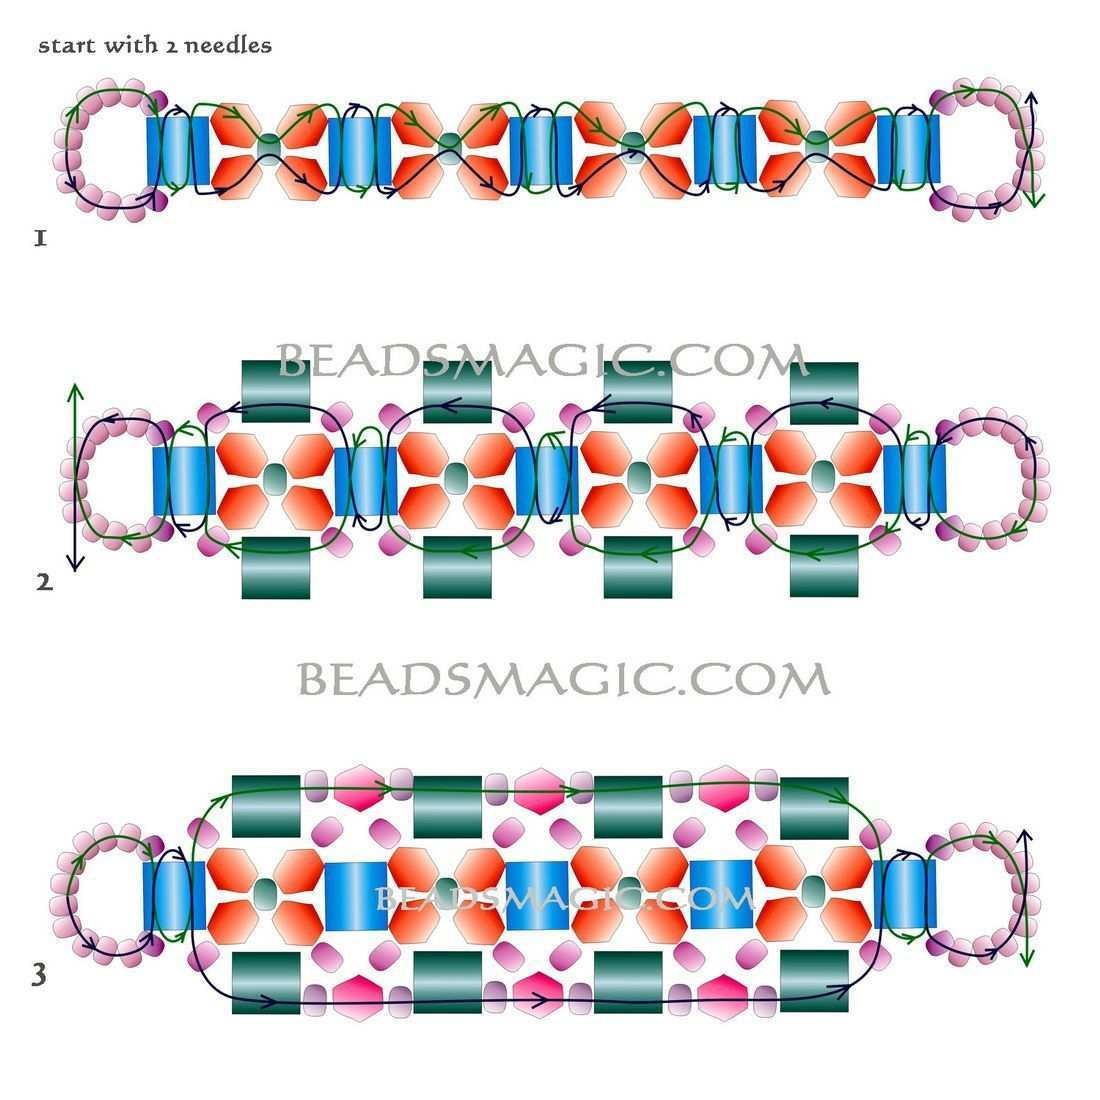 Kostenlose Muster Fur Armband Fabiana Kostenlose Muster Fur Perlen Armband Fabiana Mit Tila Bead In 2020 Armband Perlen Perlenarmband Muster Perlenarmbander Anleitung